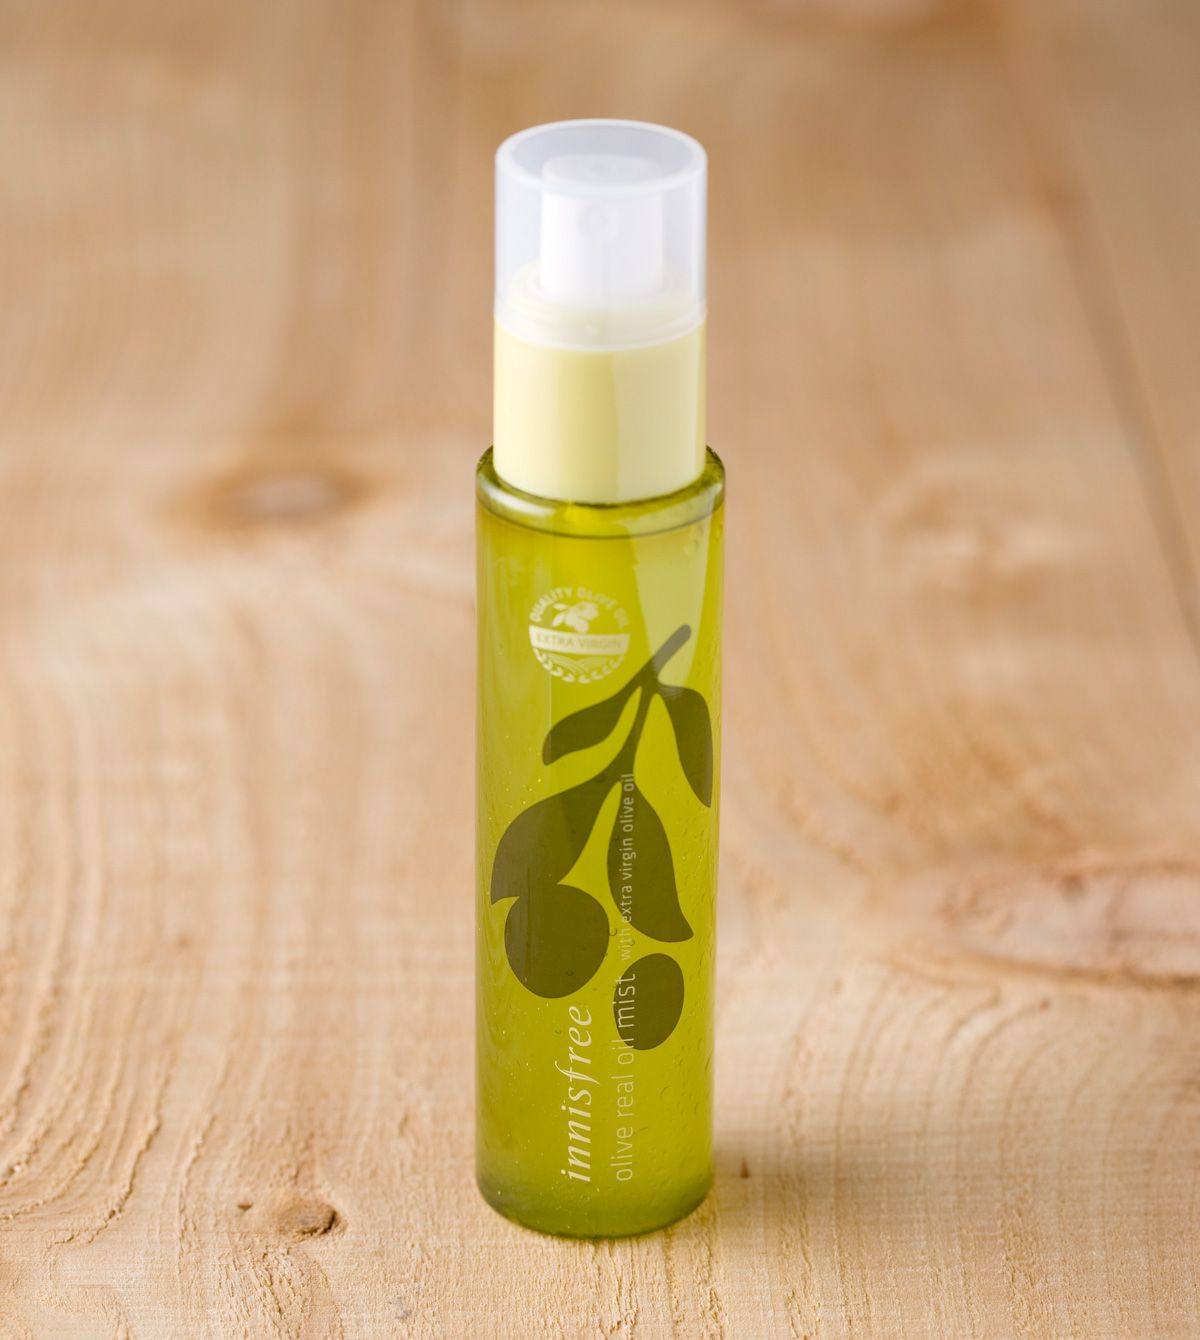 Skin Care Olive Real Oil Mist Innisfree In 2020 Effective Skin Care Products Skin Care Skin Moisturizer